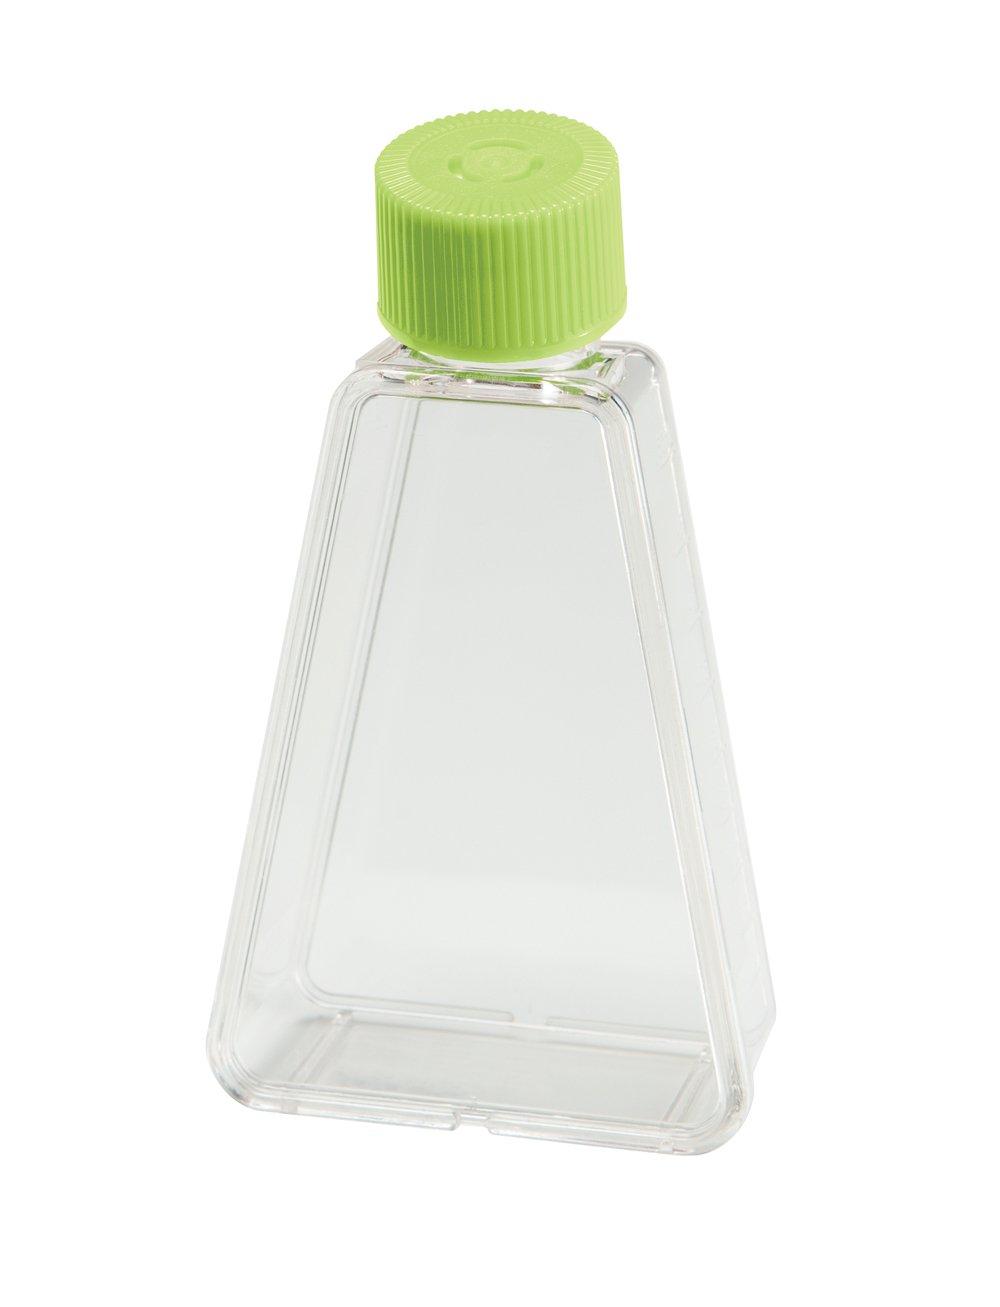 TrueLine Clear Polystyrene Sterile Triangular 75cm2 Cell Culture Flask, Non Vent Cap, 15-23ml Volume (Case of 100)